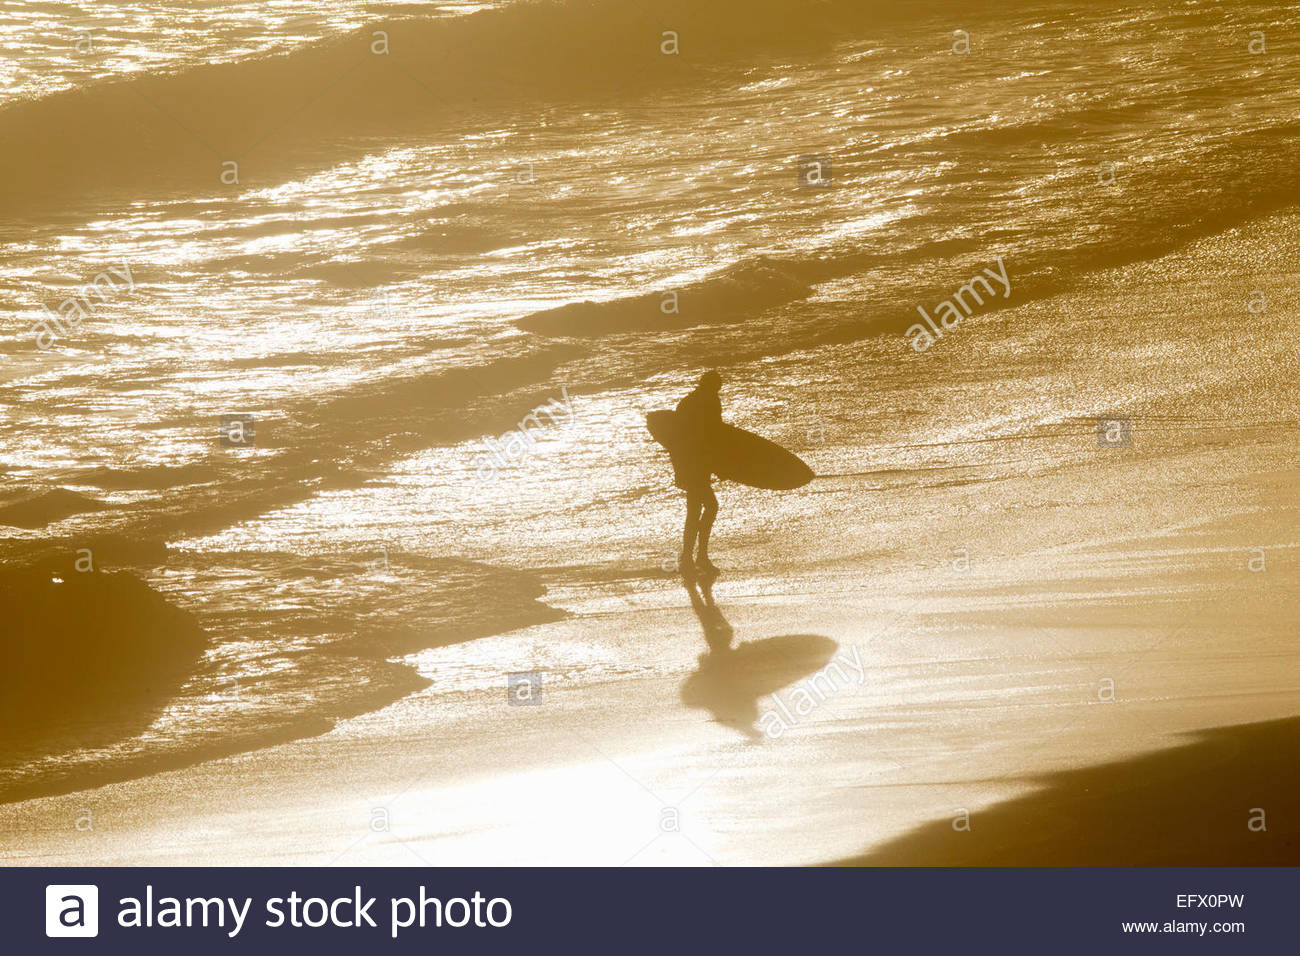 Man holding surfboard walking along beach through waves - Stock Image